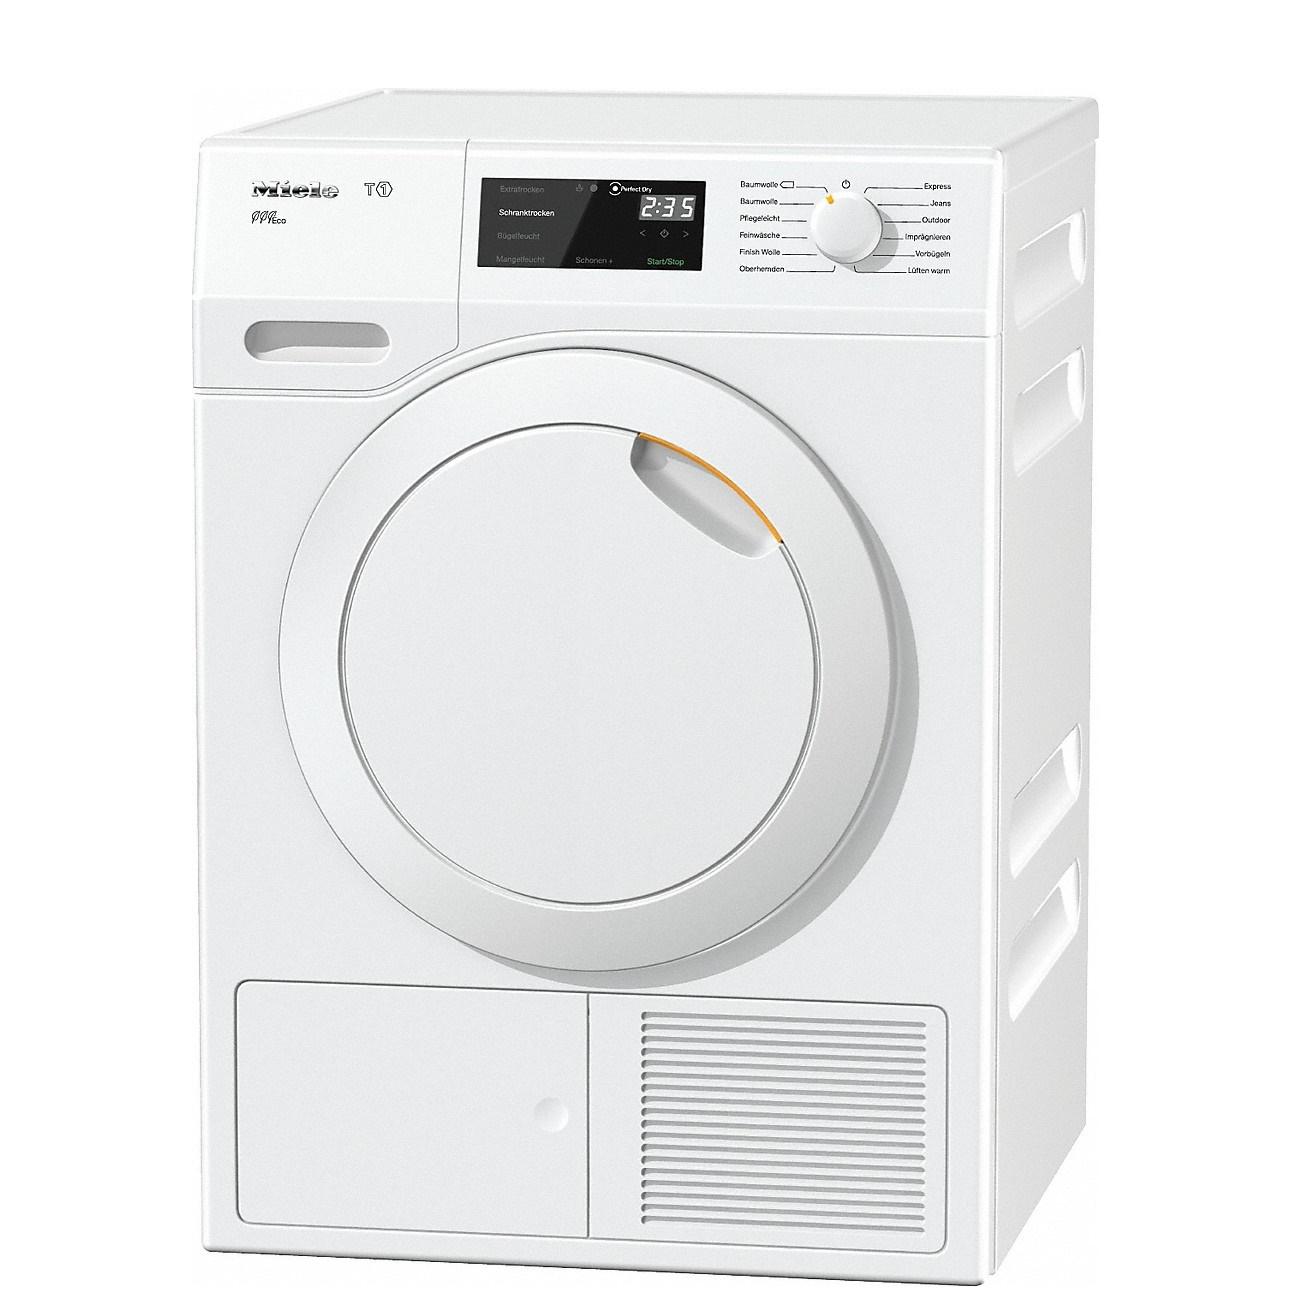 Miele mašina za sušenje TCE630WP Eco - Inelektronik